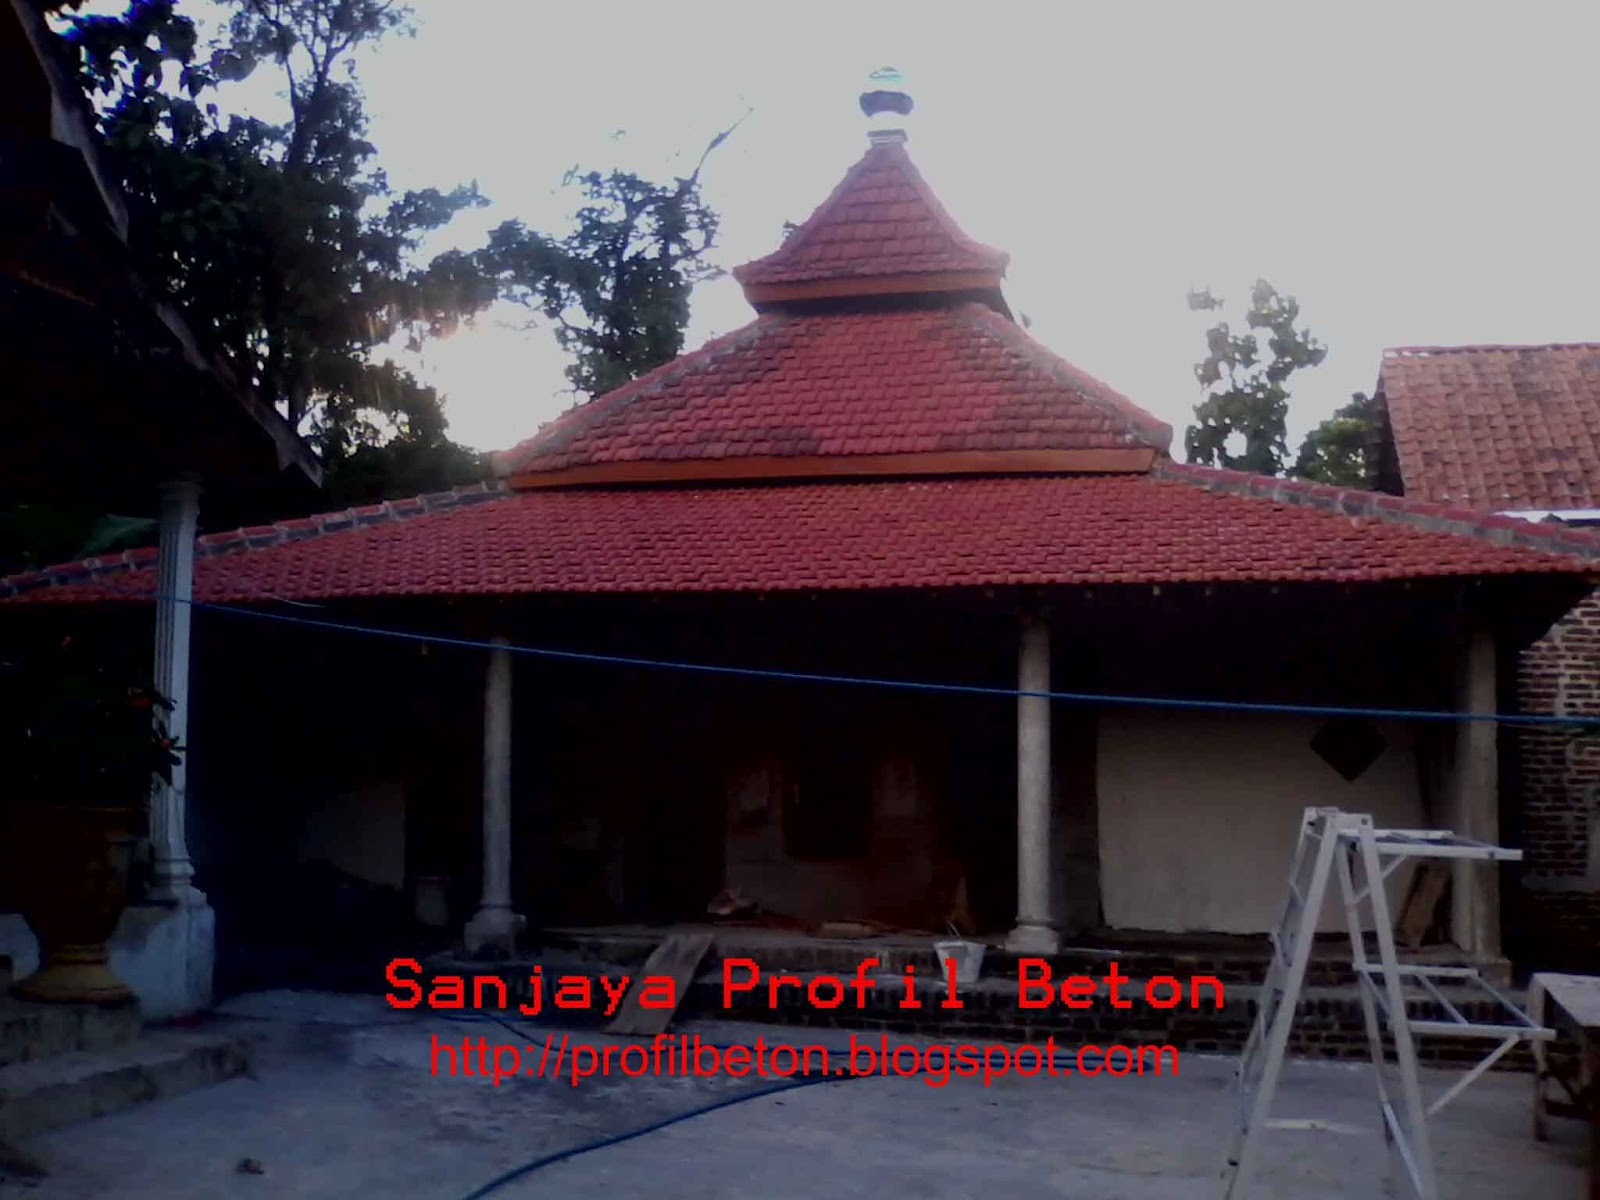 sanjaya profil beton maret 2012